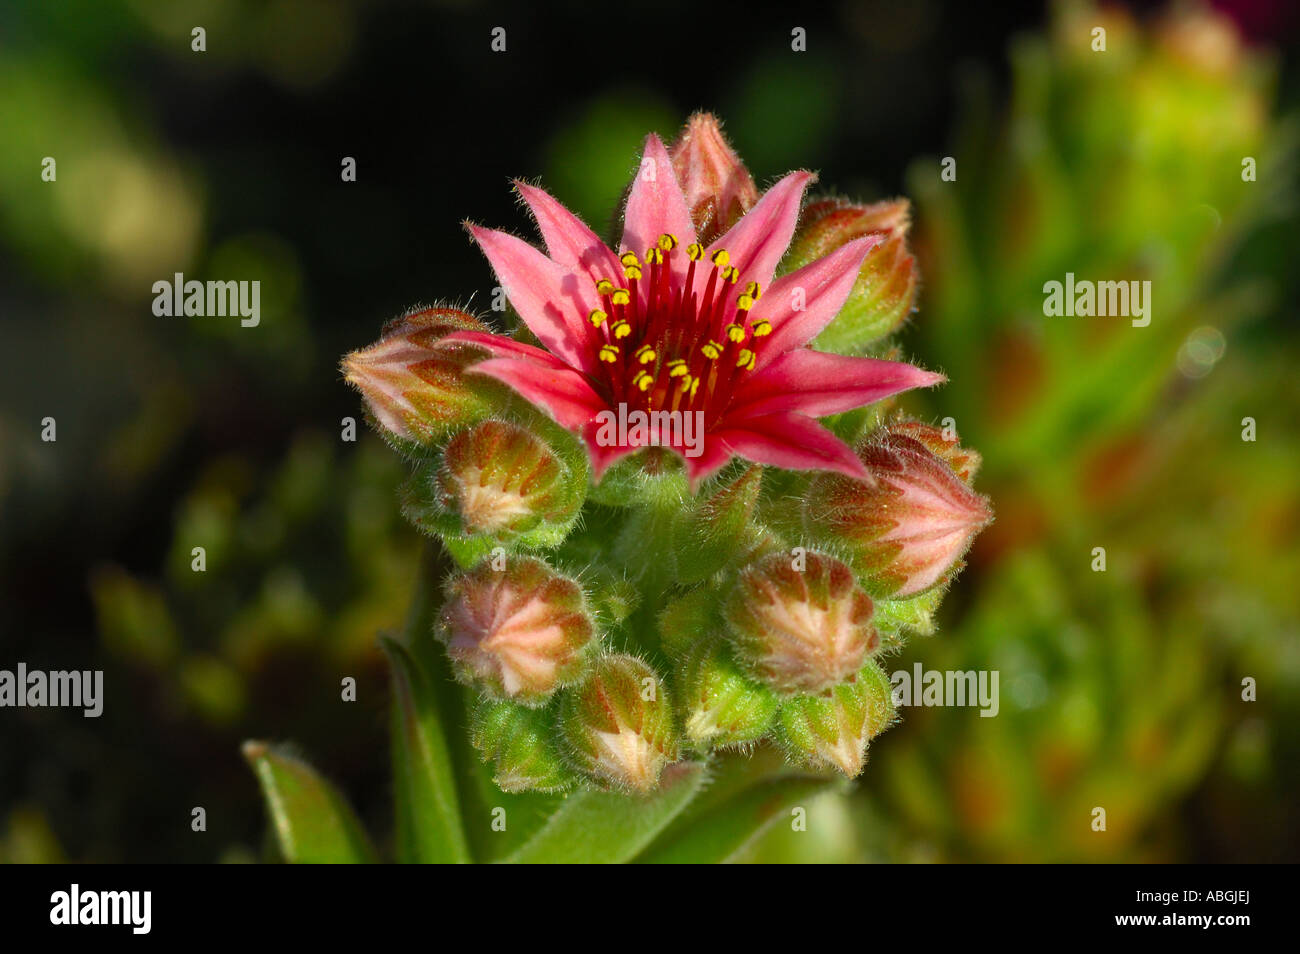 Blooming houseleek, Sempervivum - Stock Image